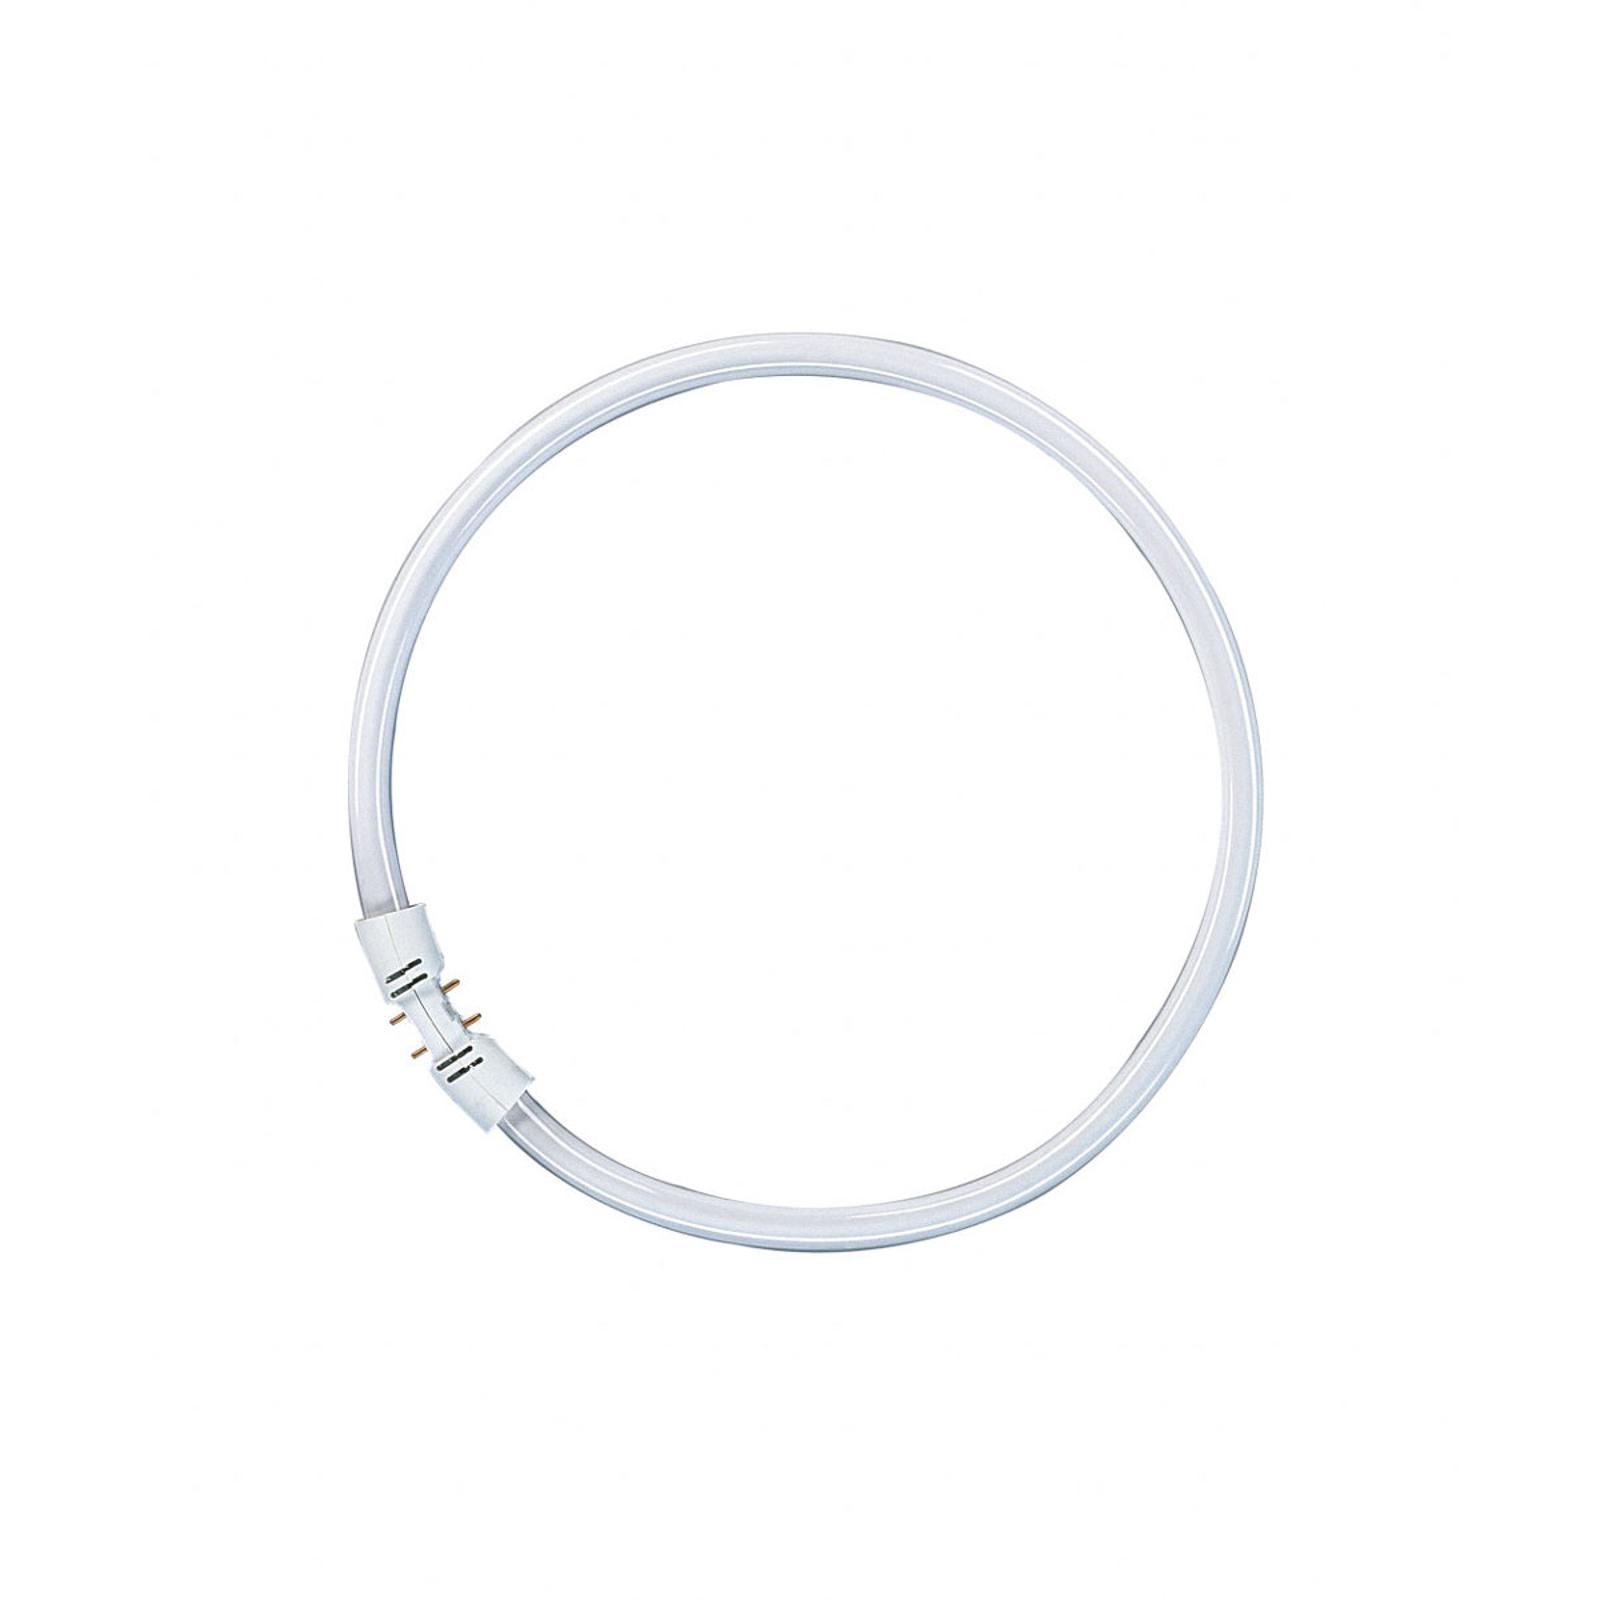 2Gx13 LUMILUX T5 Ring-lysstoffpære 55W 865